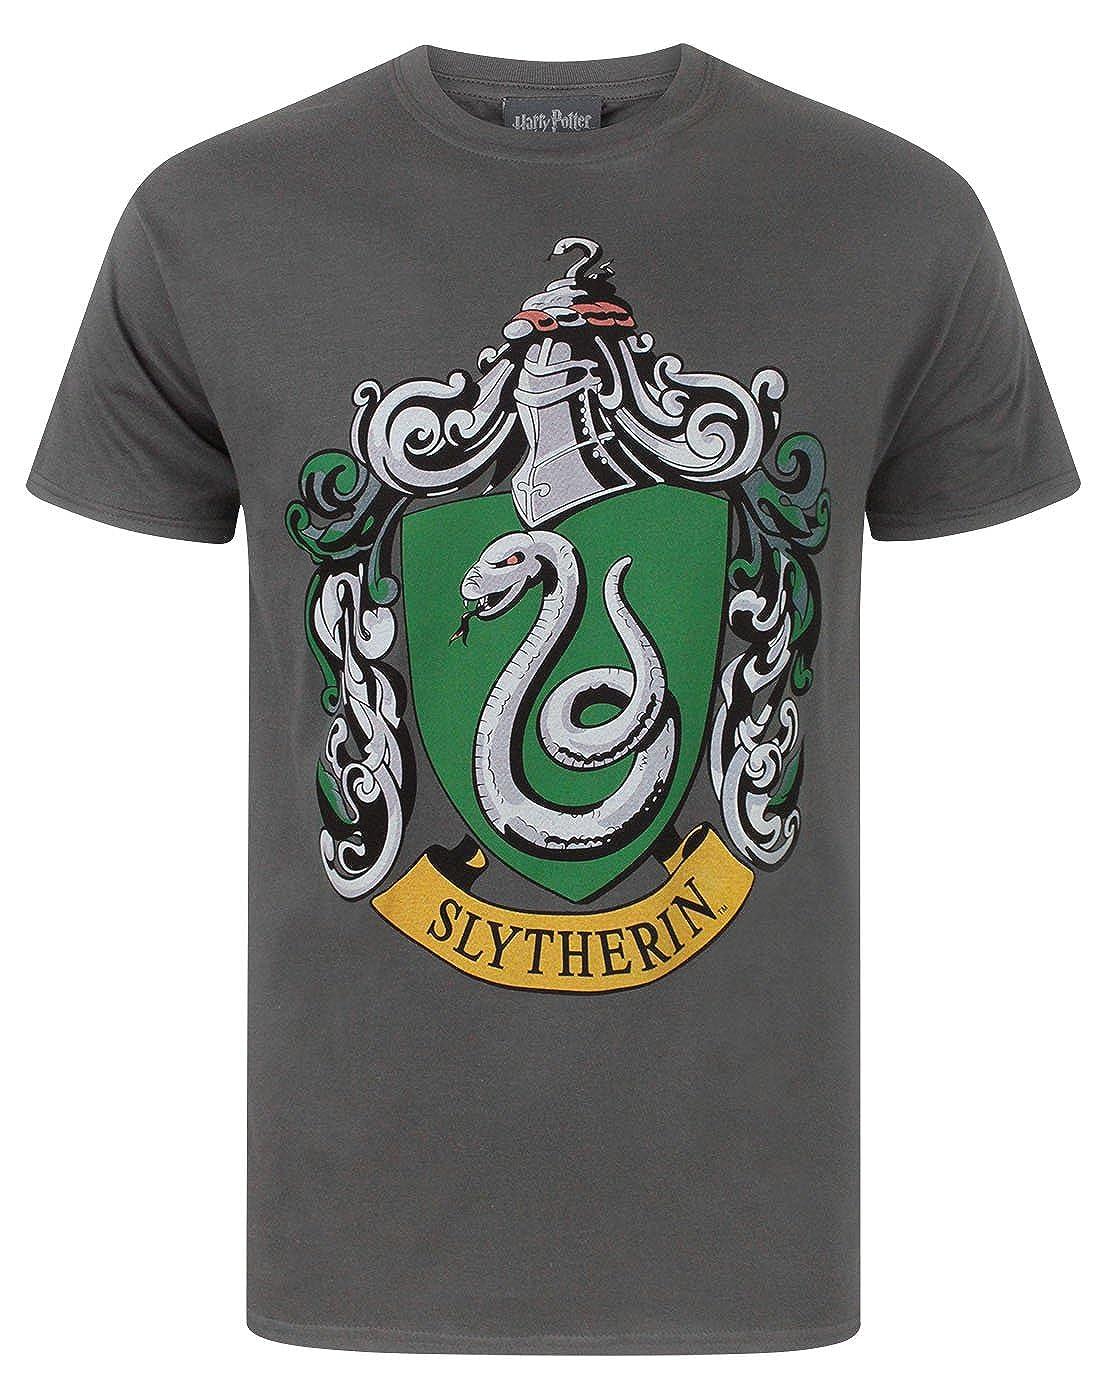 Official Harry Potter Slytherin Men's T-Shirt